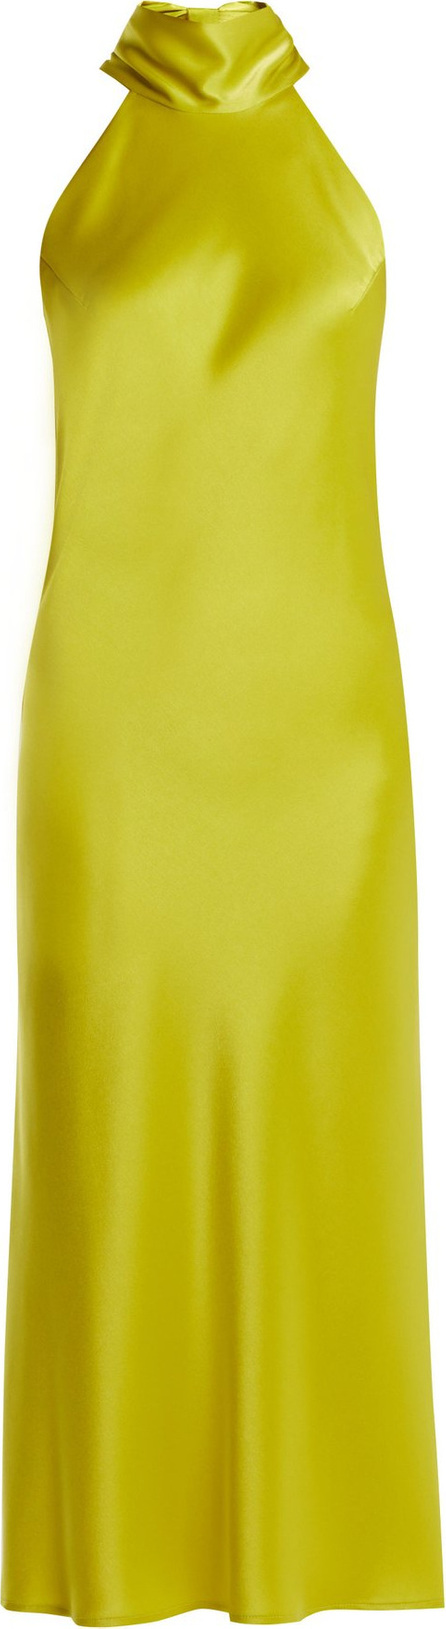 Galvan Sienna bias-cut satin dress